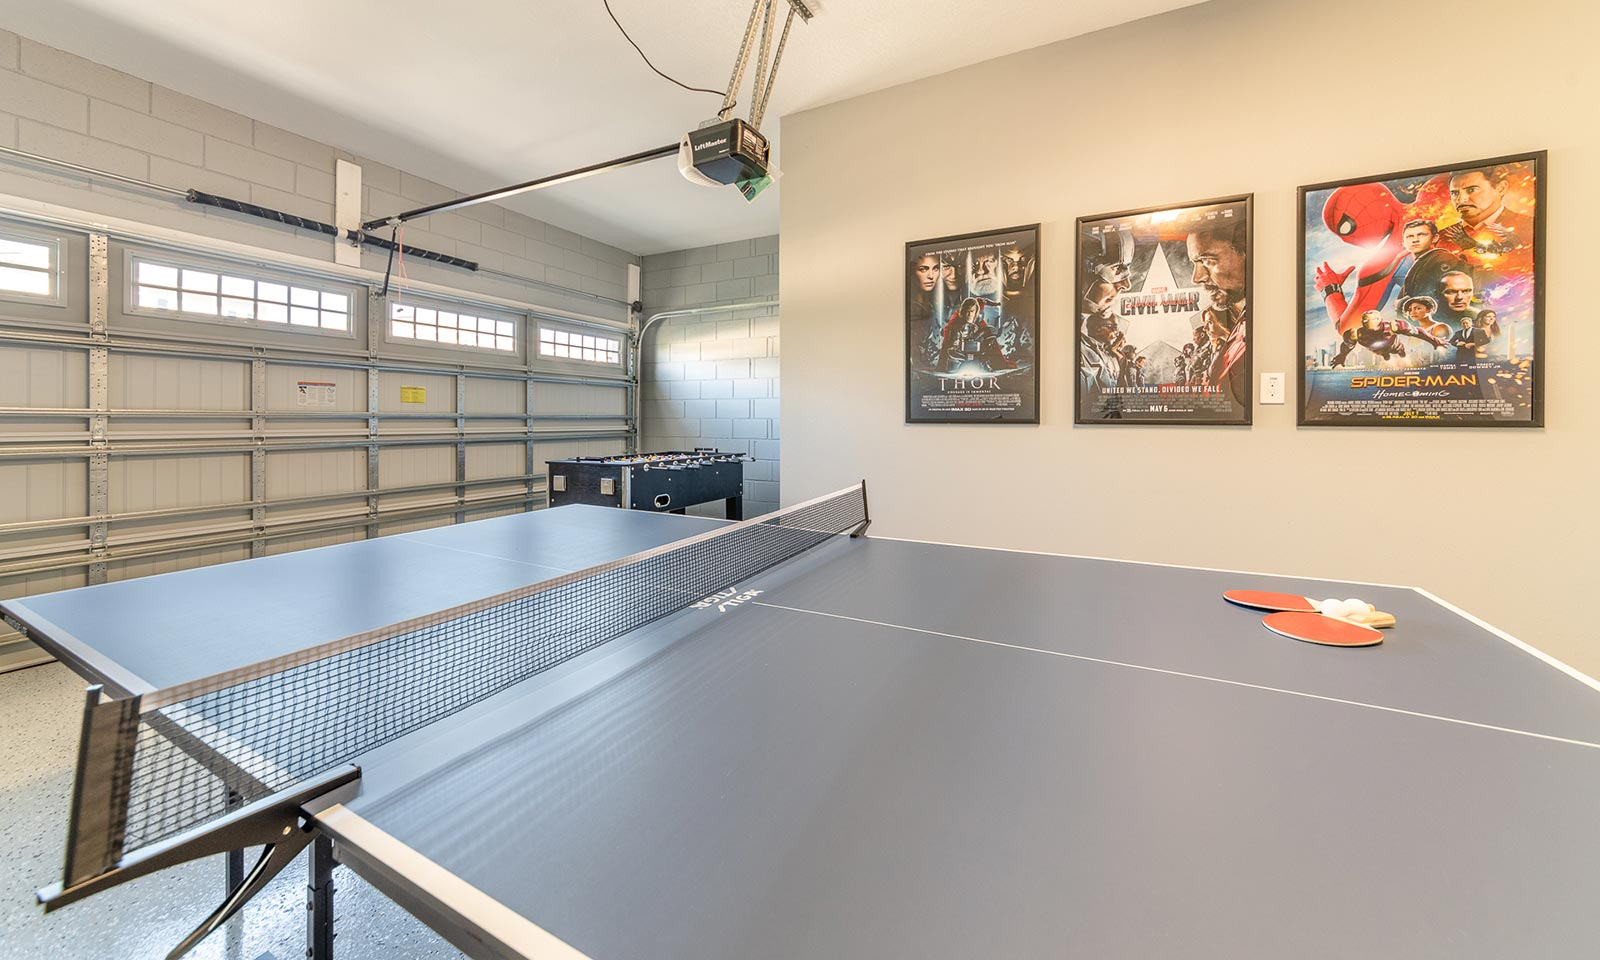 [amenities:ping-pong:3] Ping Pong